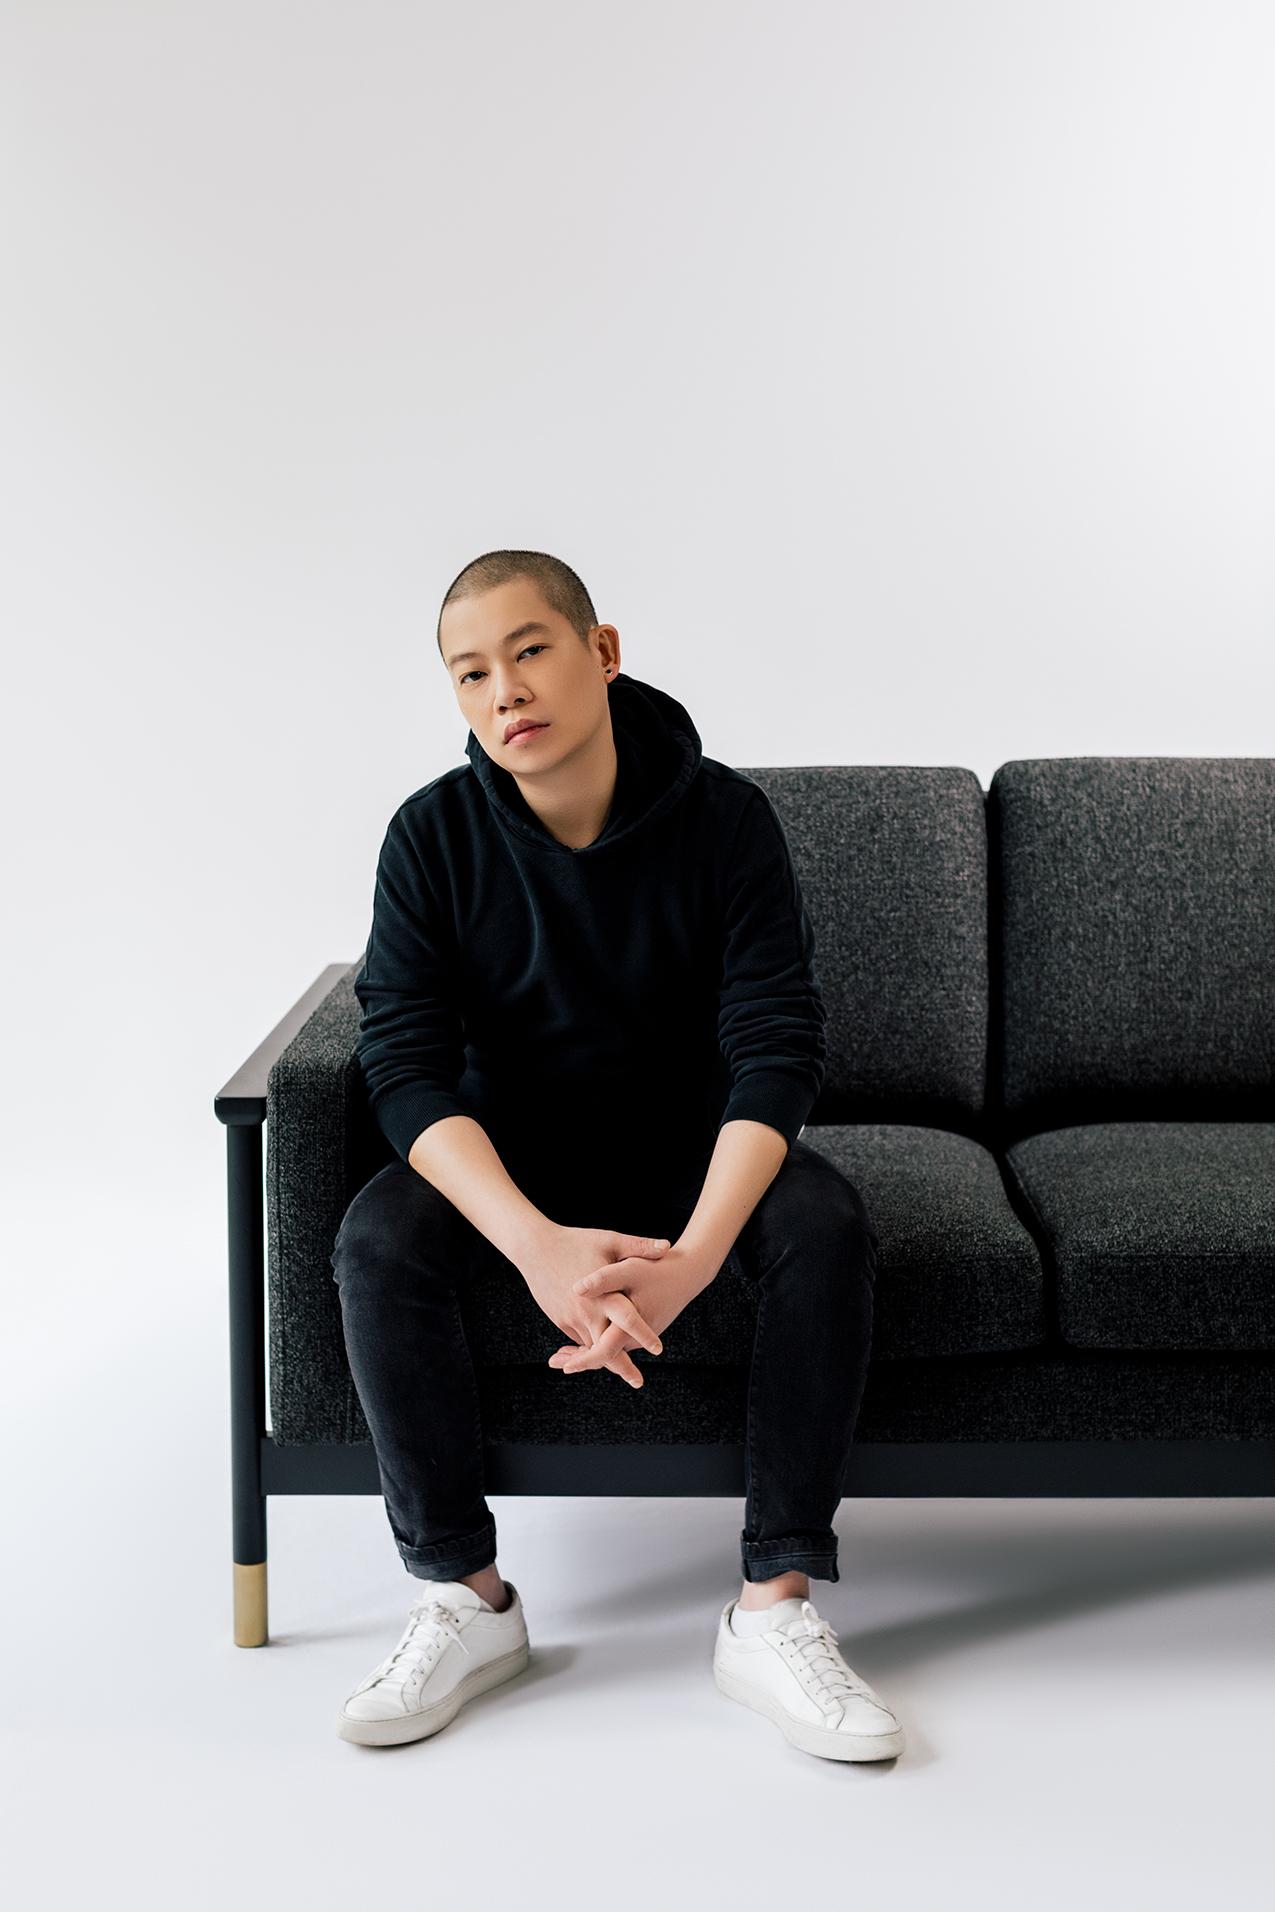 Debuting New Line, Jason Wu Predicts Custom Is The Future